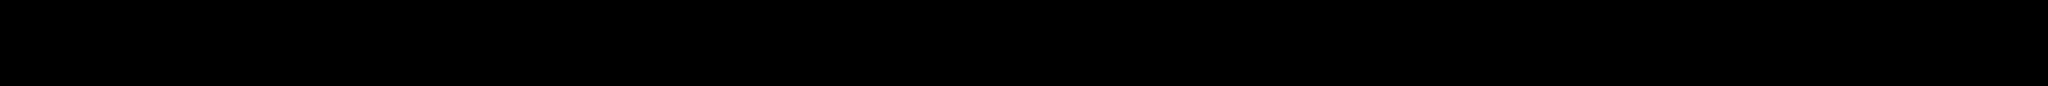 JP GROUP Fußmattensatz